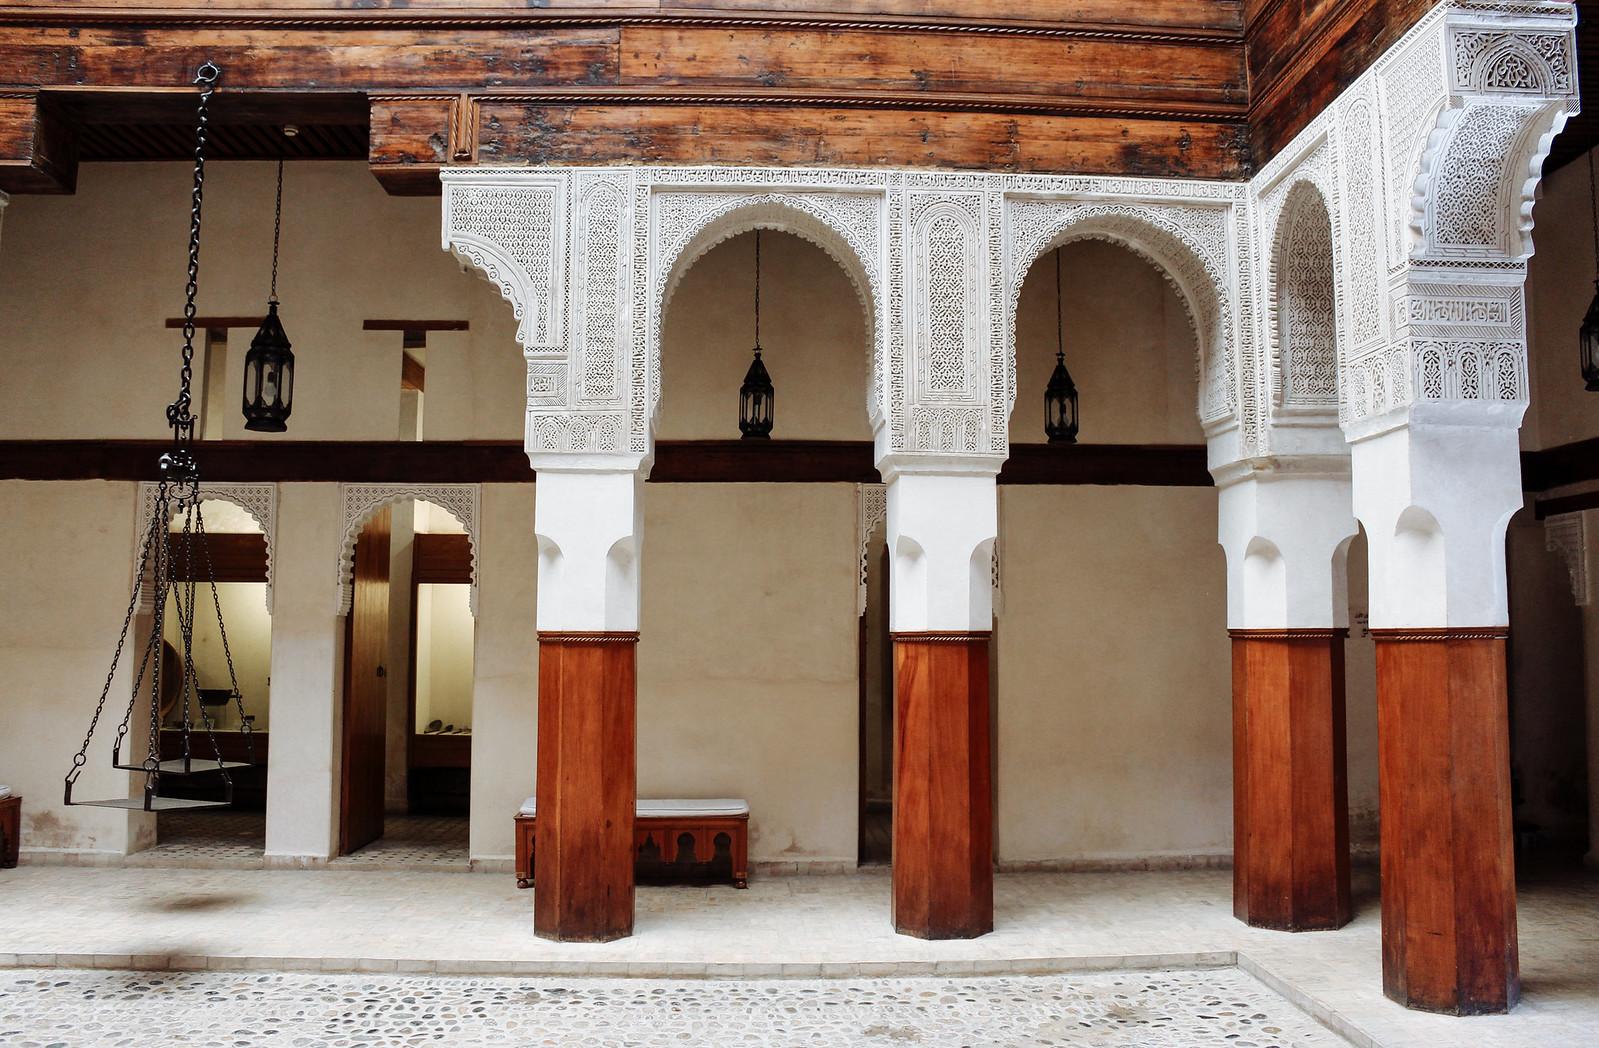 Fes Morocco - kisses,vera-10